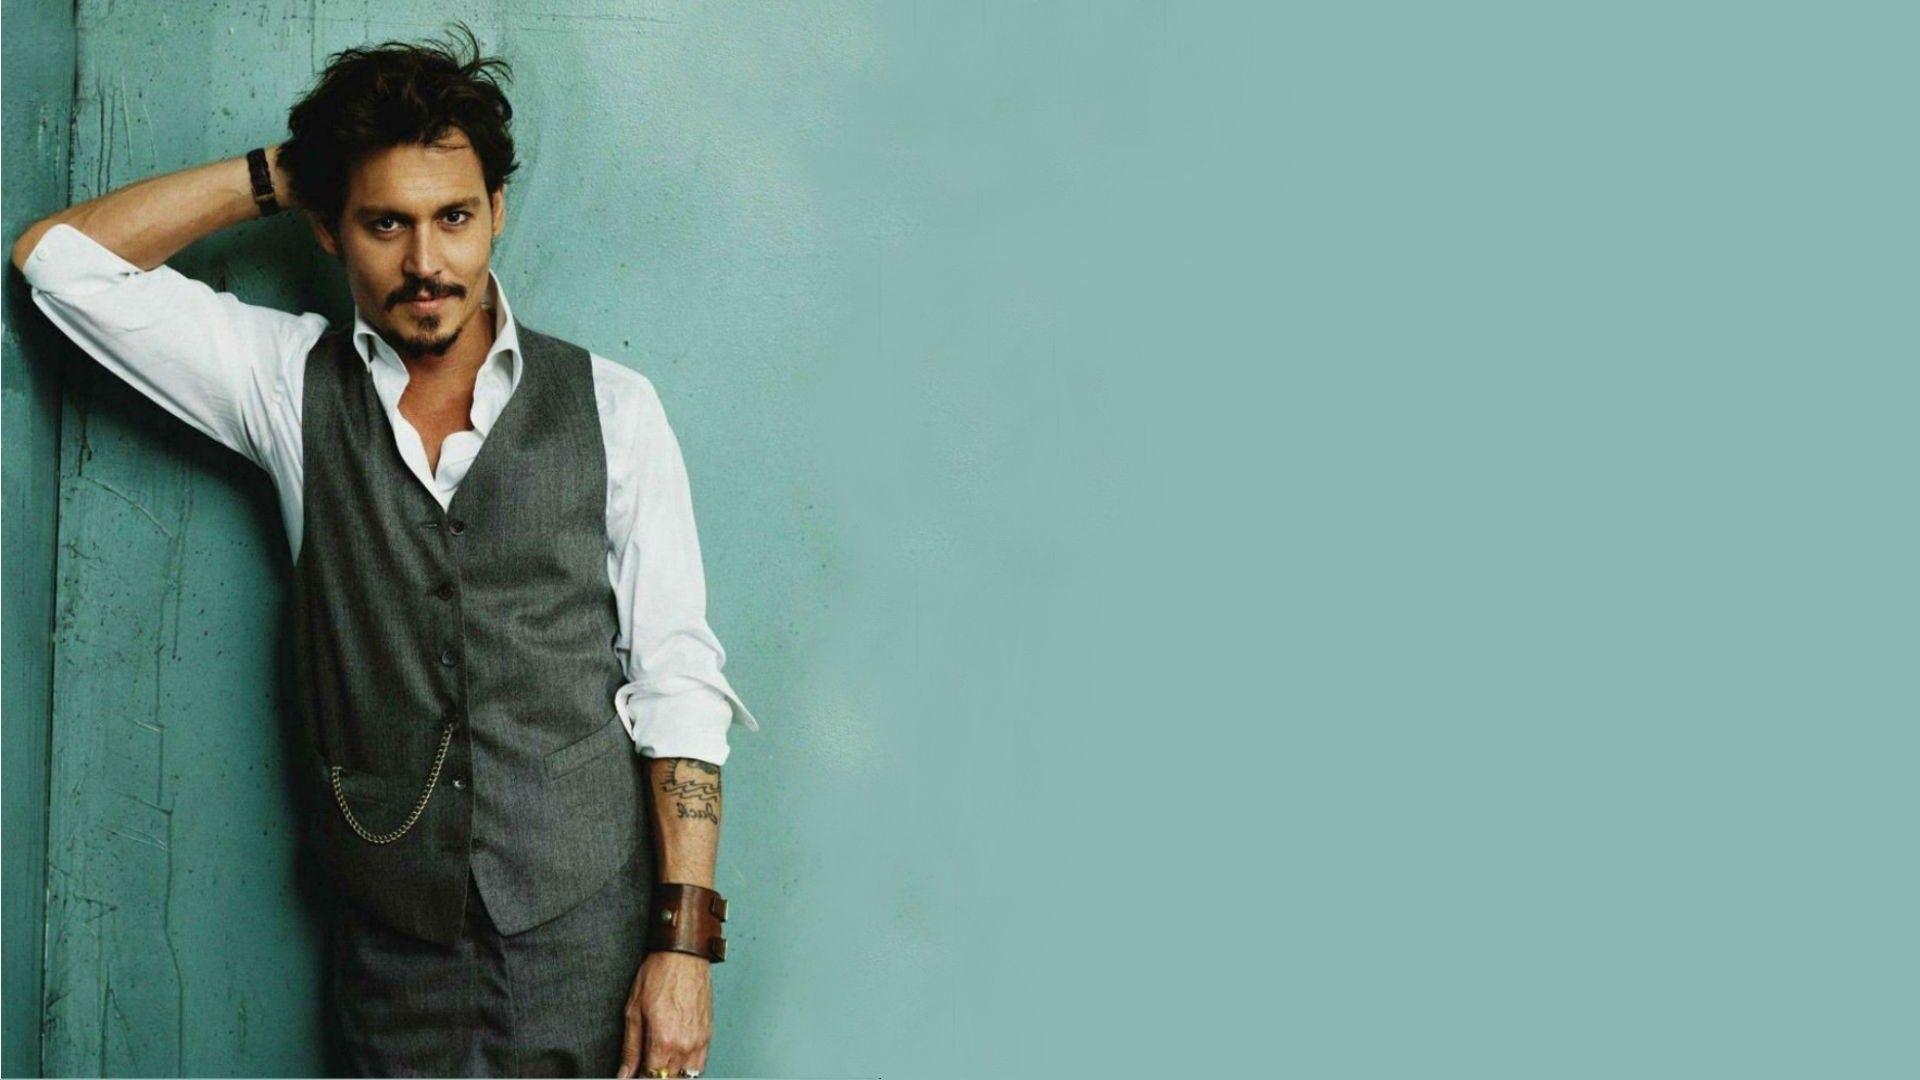 Johnny Depp Johnny Depp Wallpaper Johnny Depp Johnny